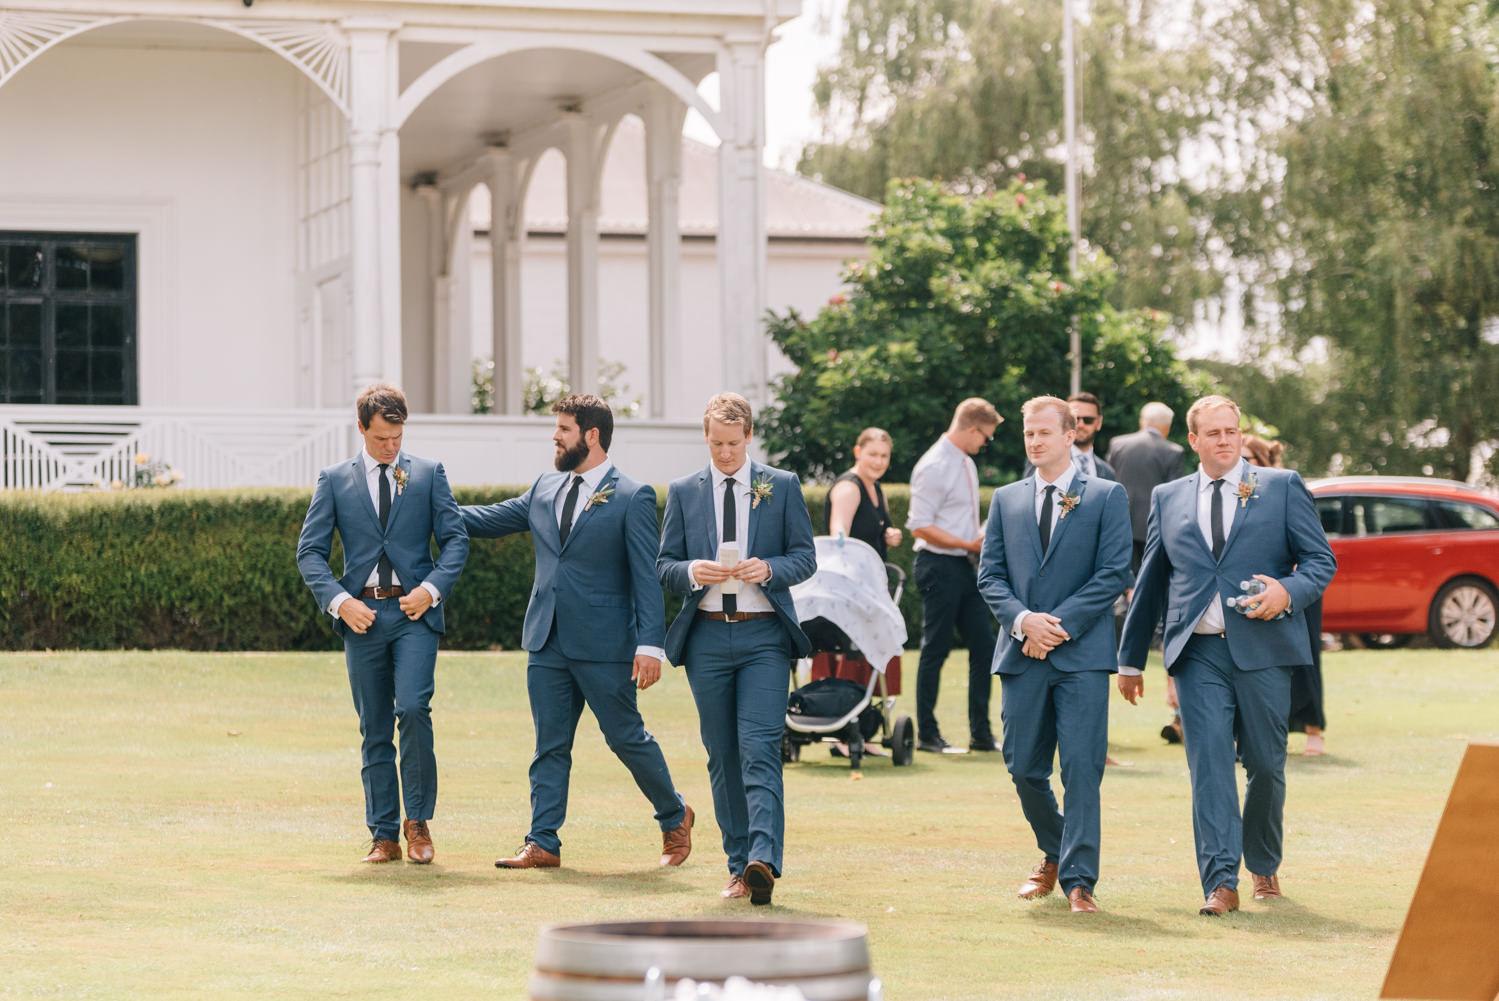 Quamby-Wedding-Photographer-47.jpg